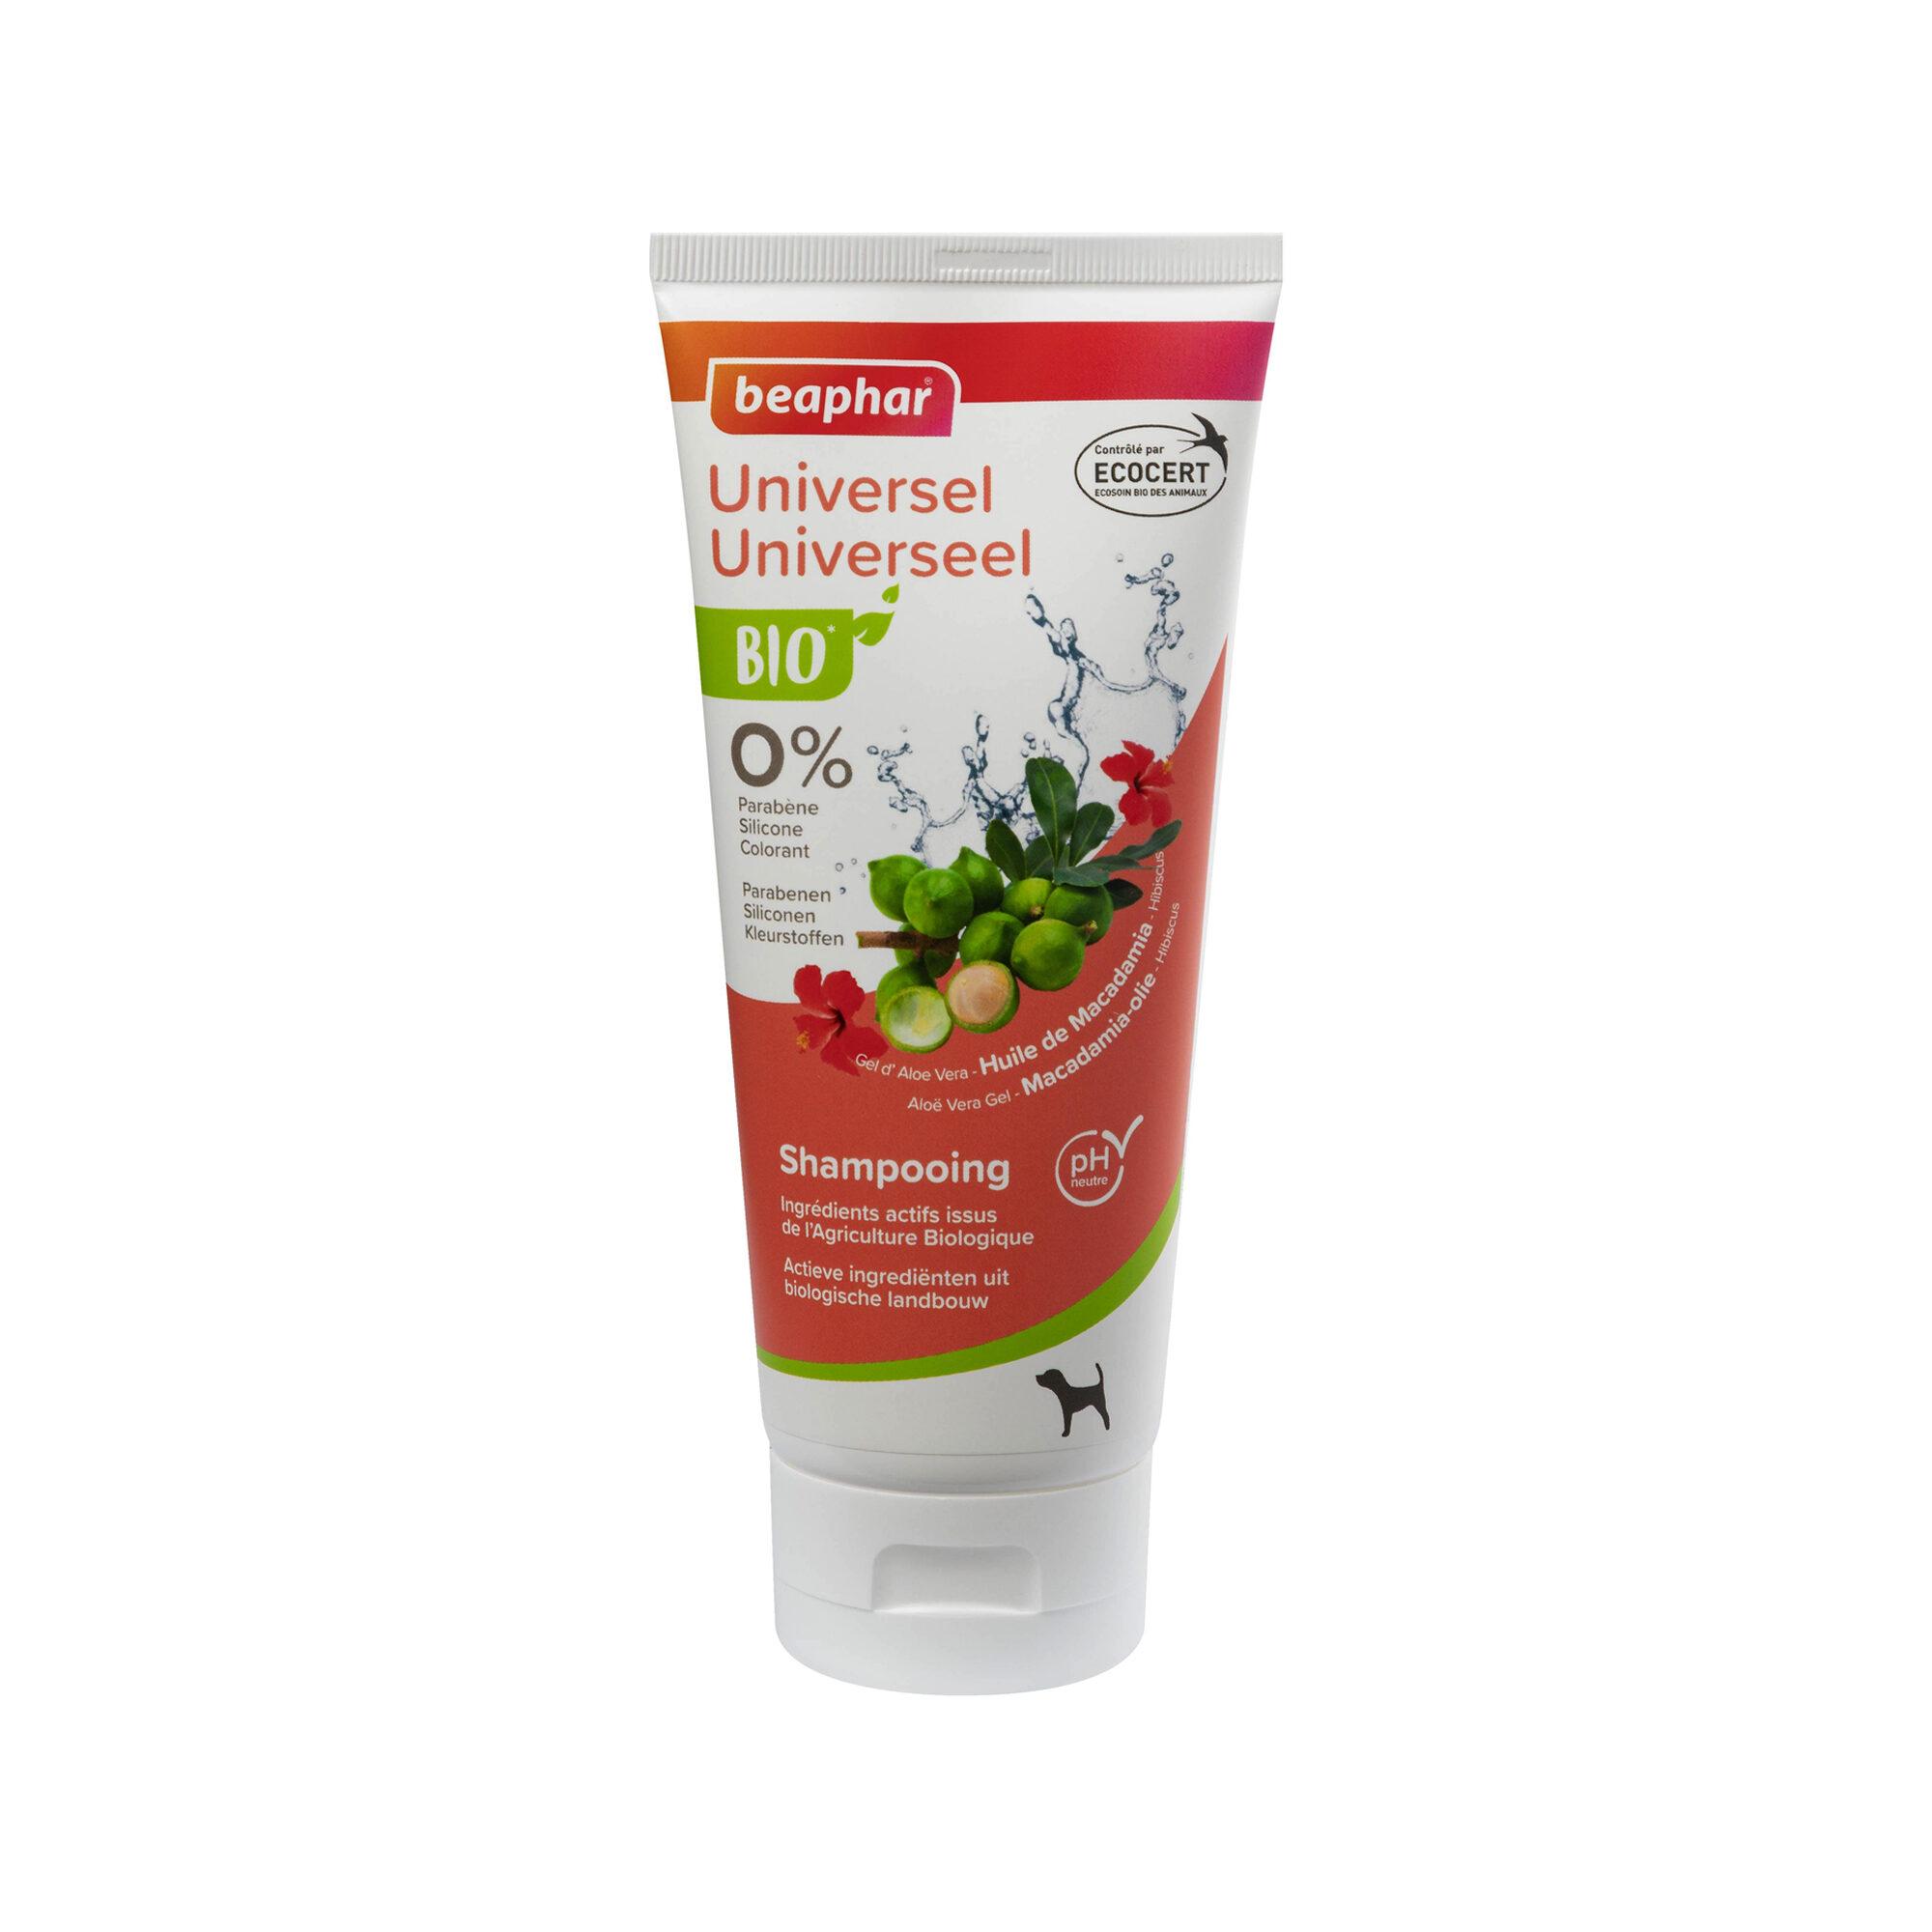 Beaphar Bio - Shampoing universel - Chien - 200 ml